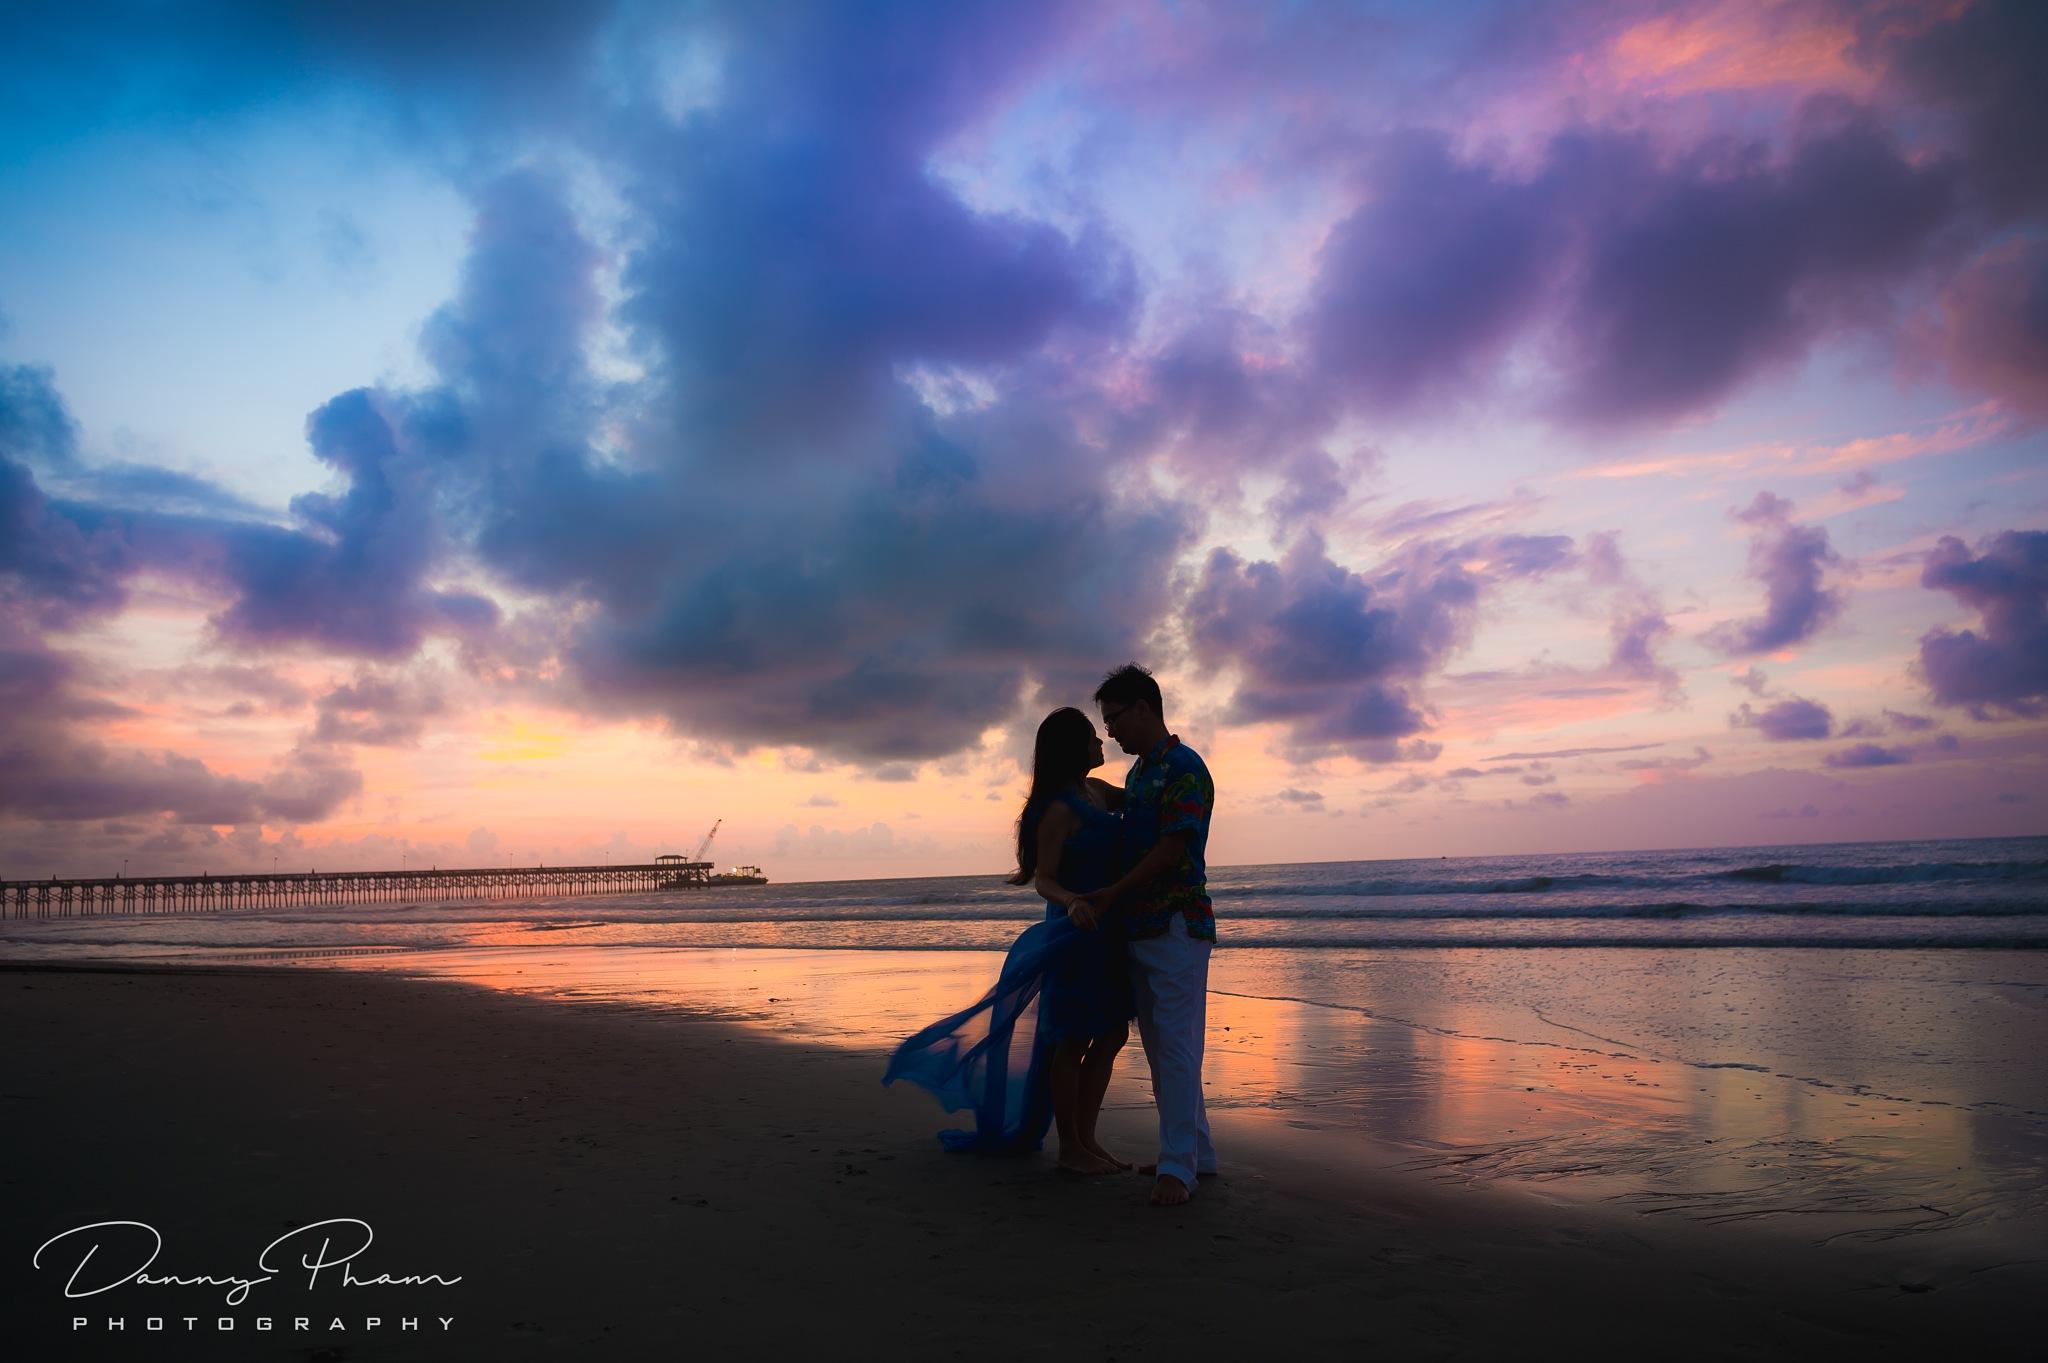 Sunrise @ Myrtle Beach, SC by Danny Pham